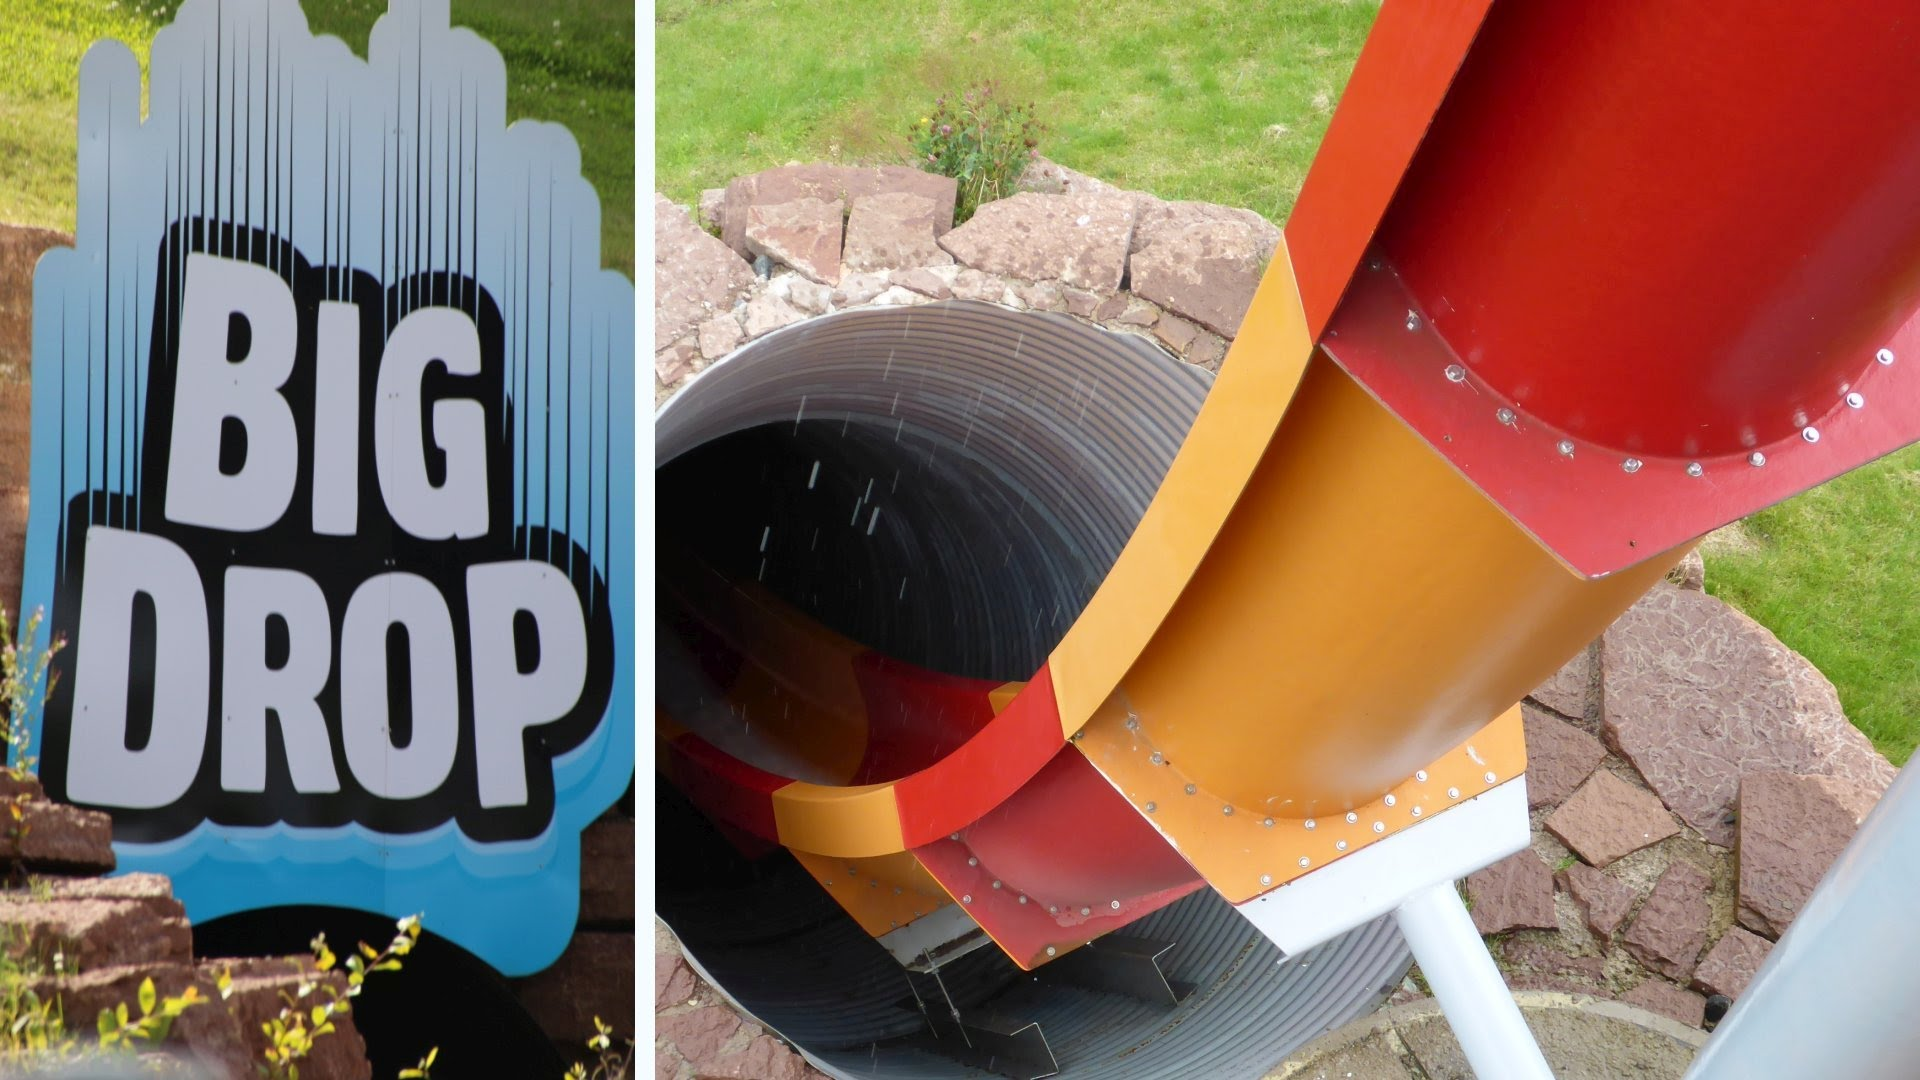 Big Drop - Kamikaze-Rutsche :: Free Fall Slide | Skara Sommarland